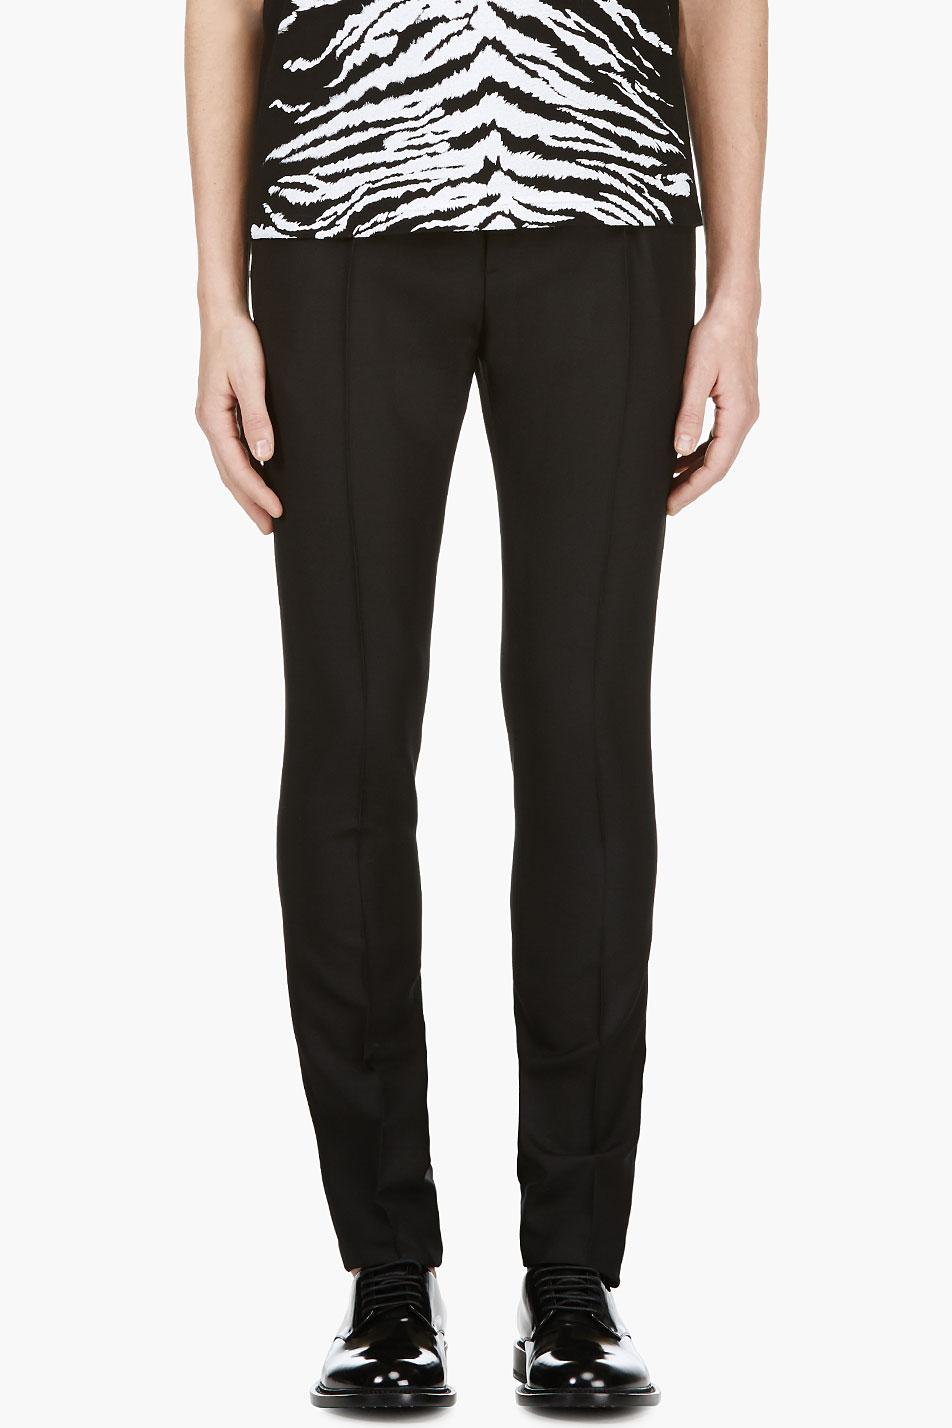 Saint Laurent Black Pleated Classic Trousers